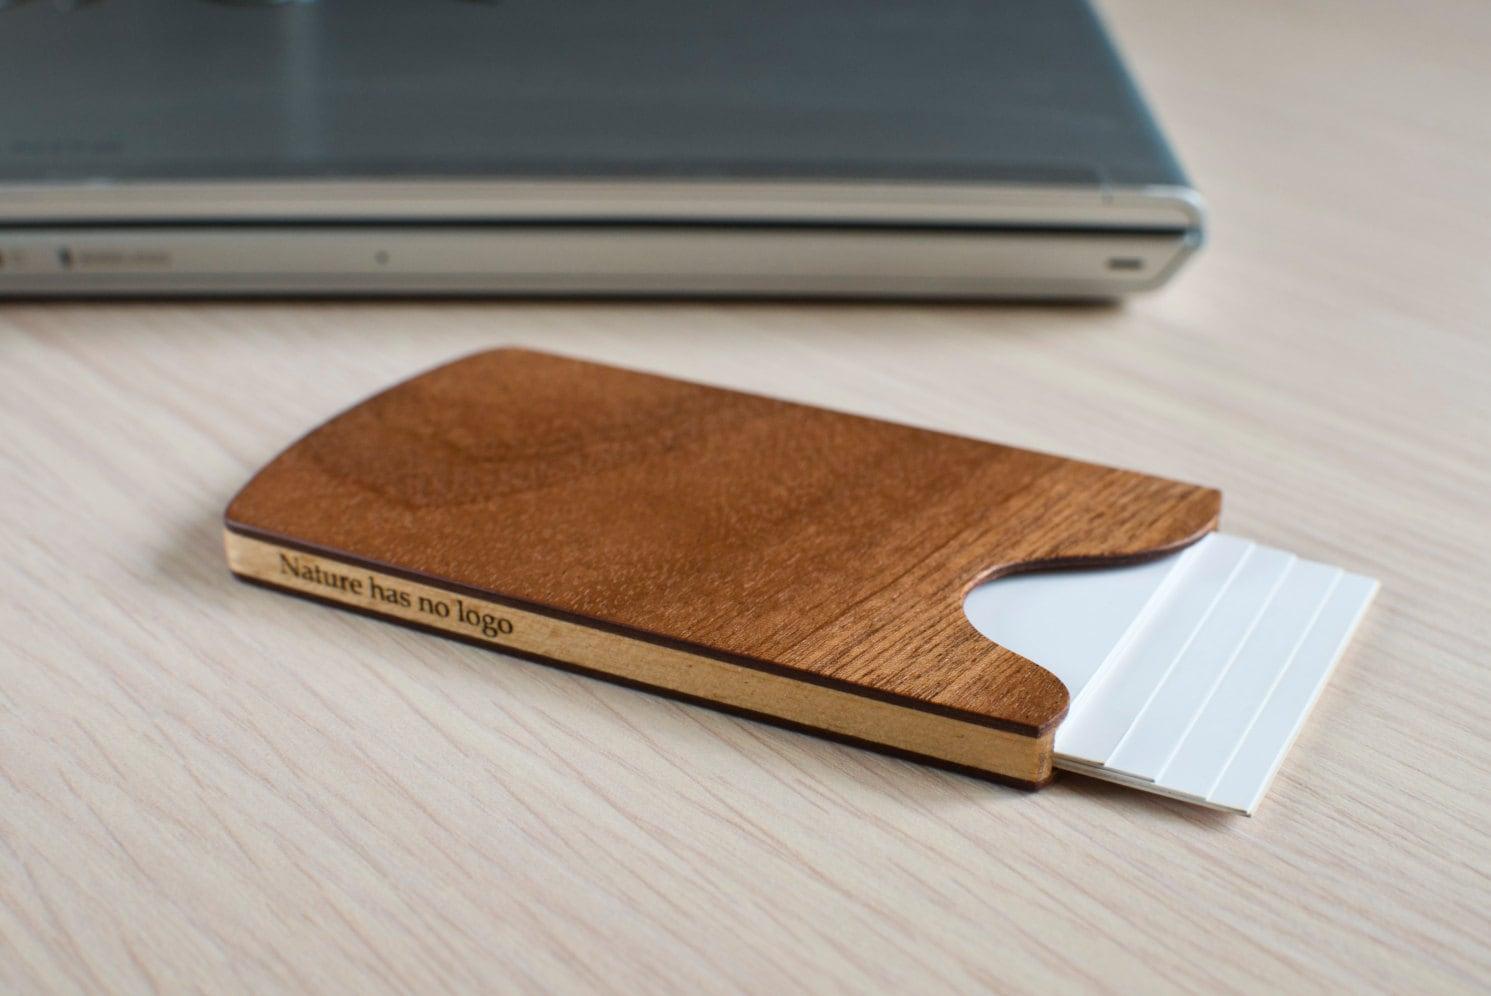 Handmade wooden business card holder sapele by nologodesigns for Wooden business card holders